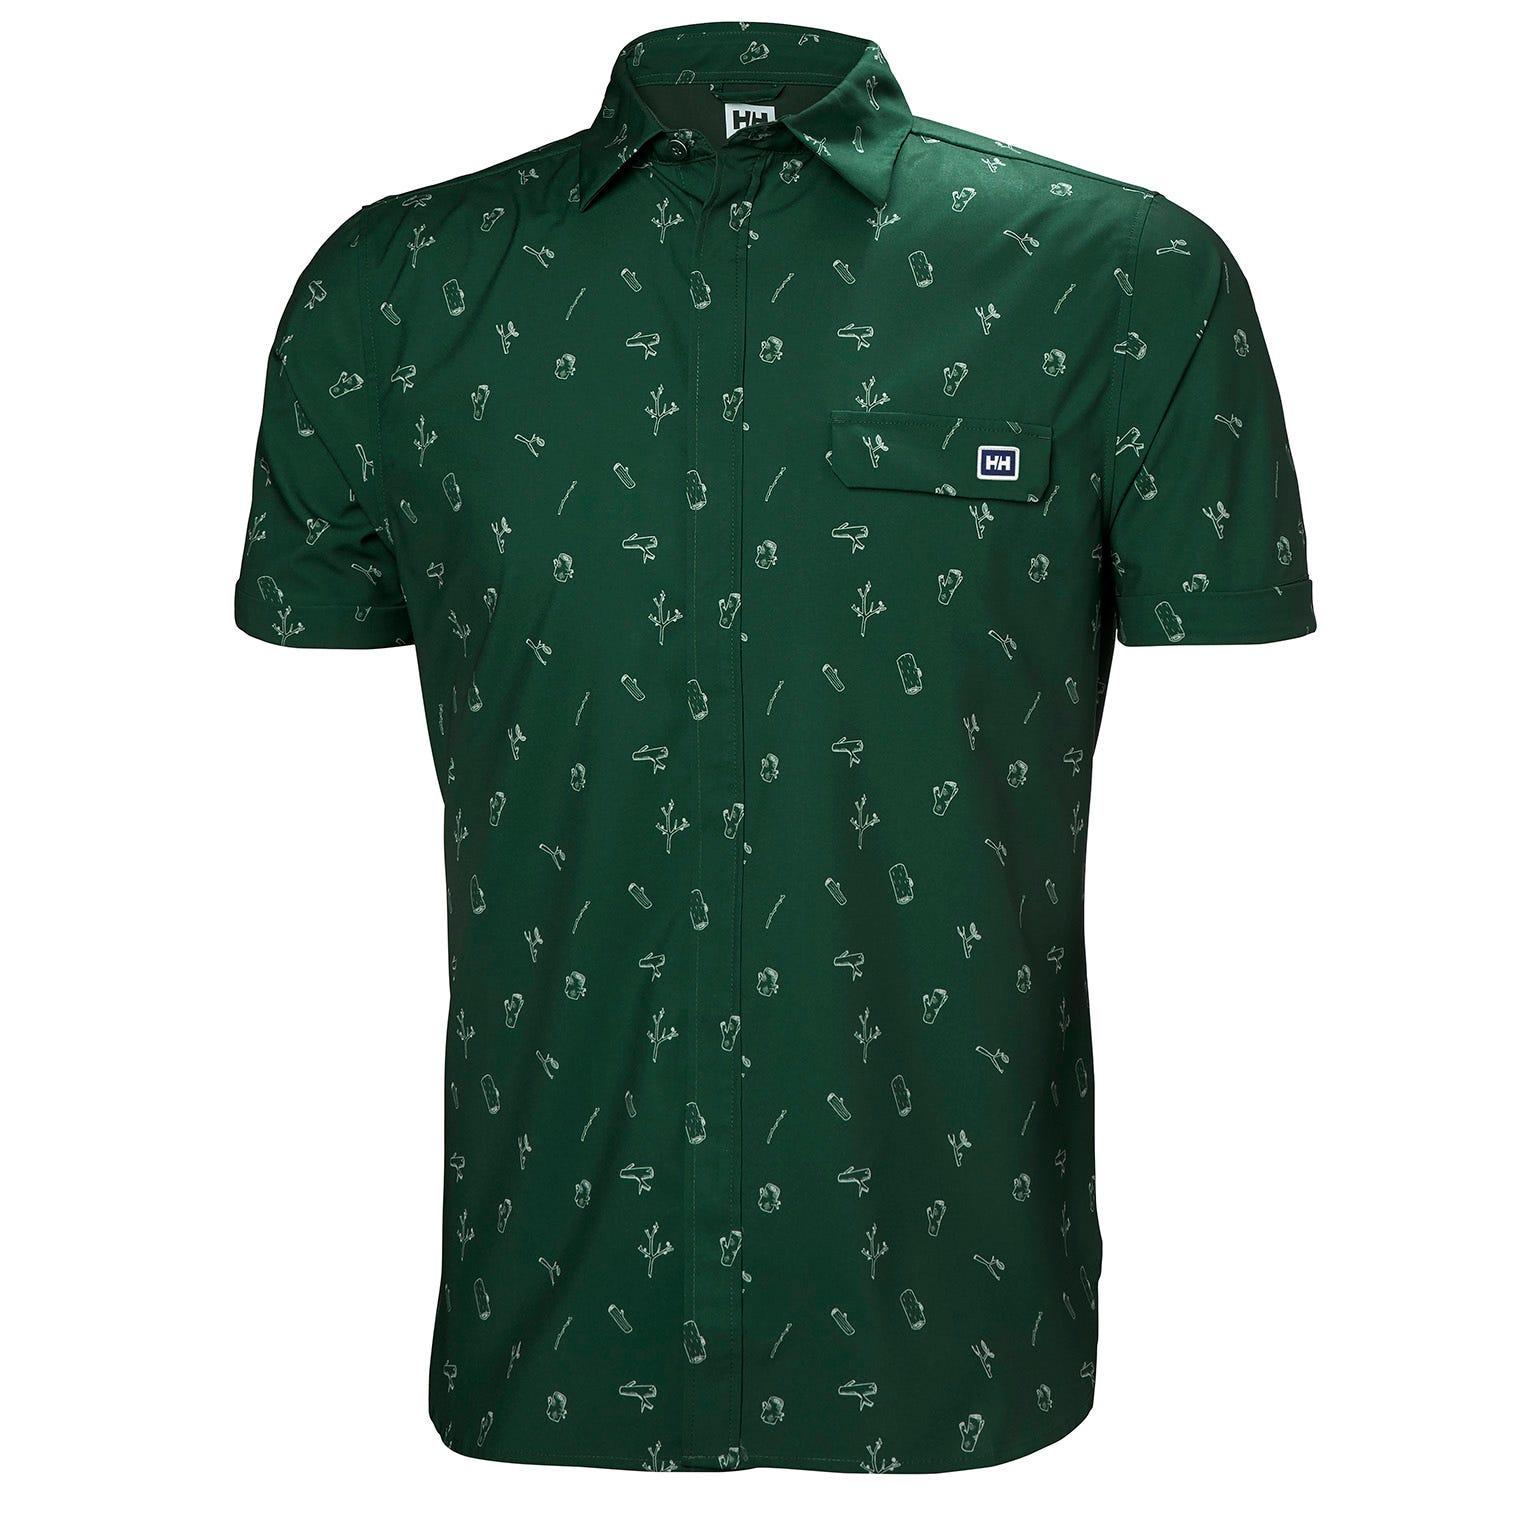 Helly Hansen Oya Shirt Mens Green S